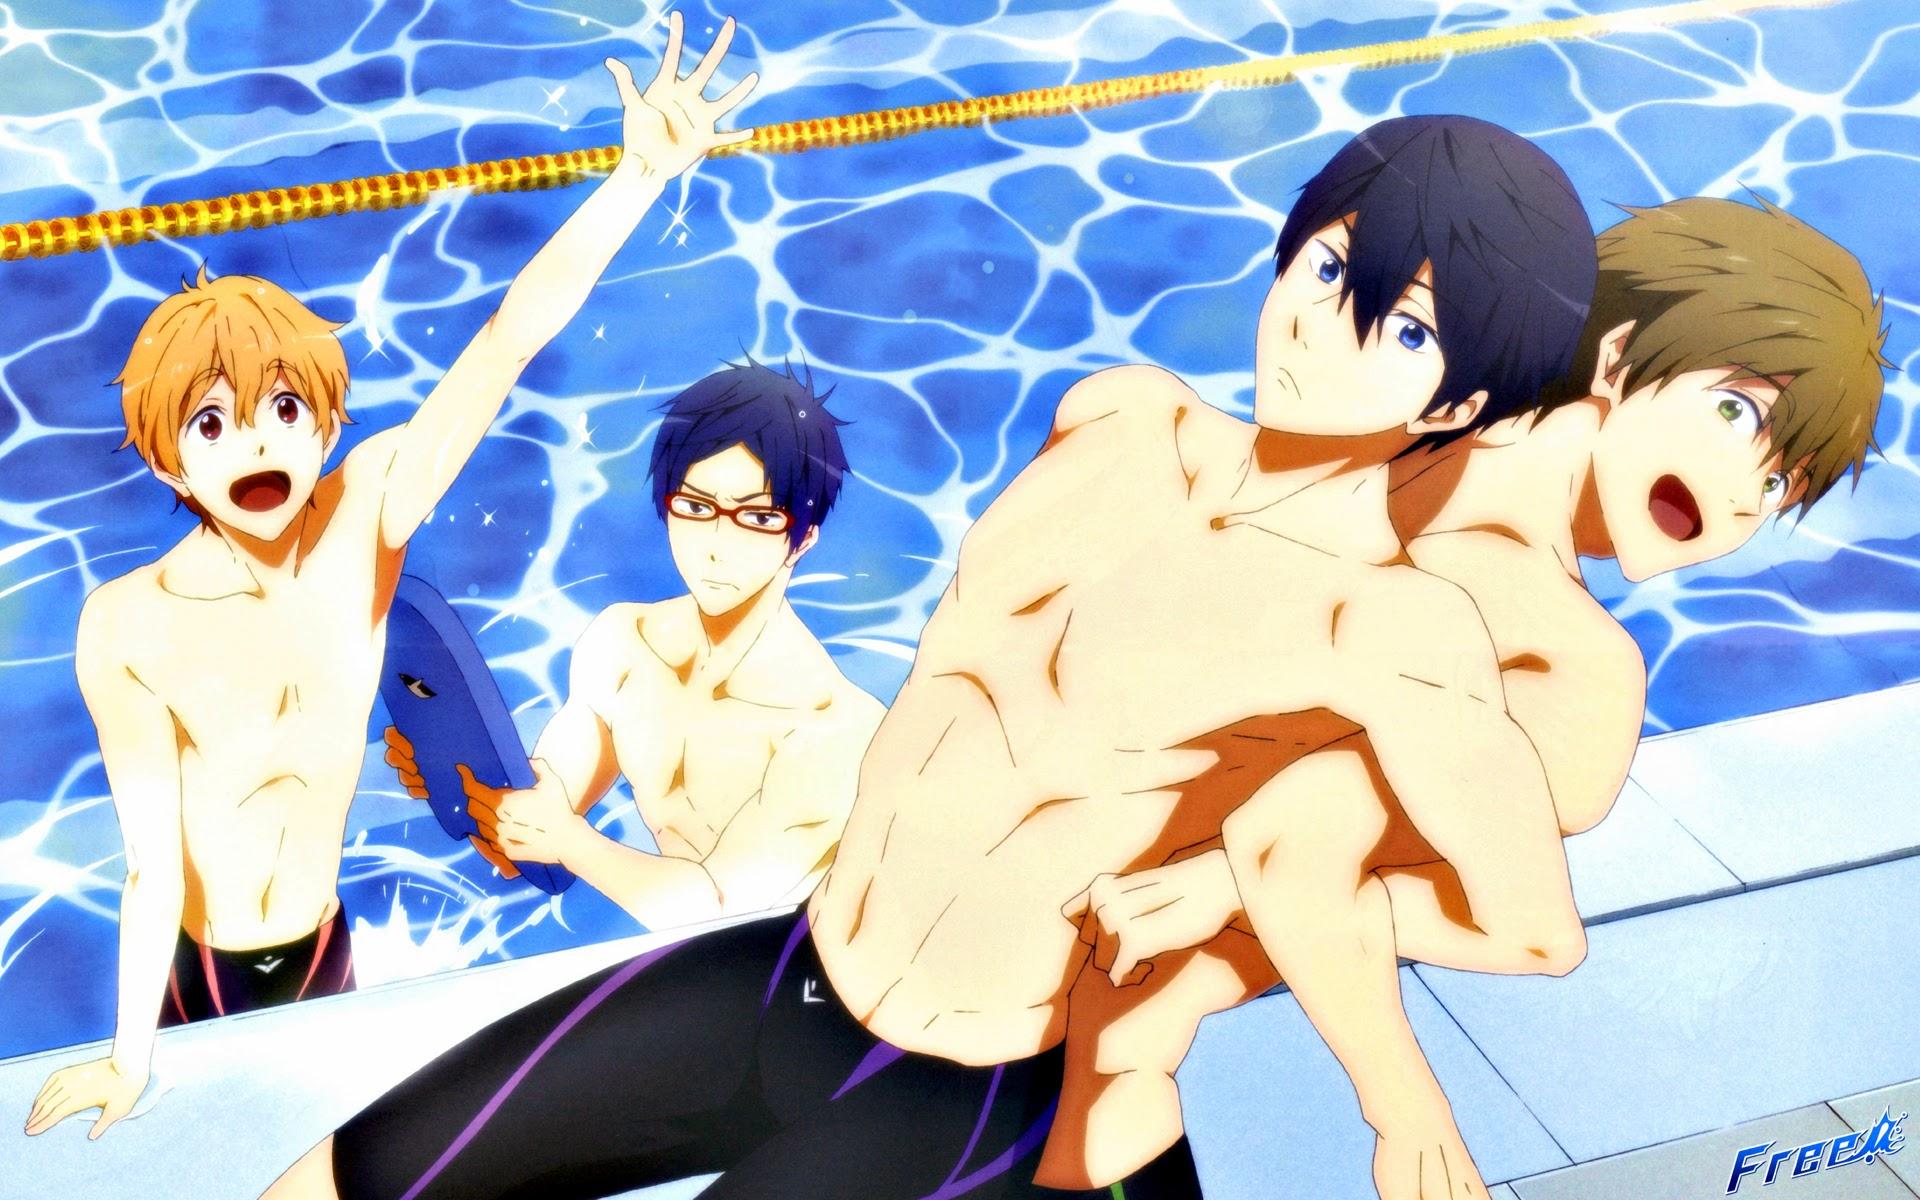 Anime Iwatobi Swim Club 01b HD Wallpaper 1920x1200